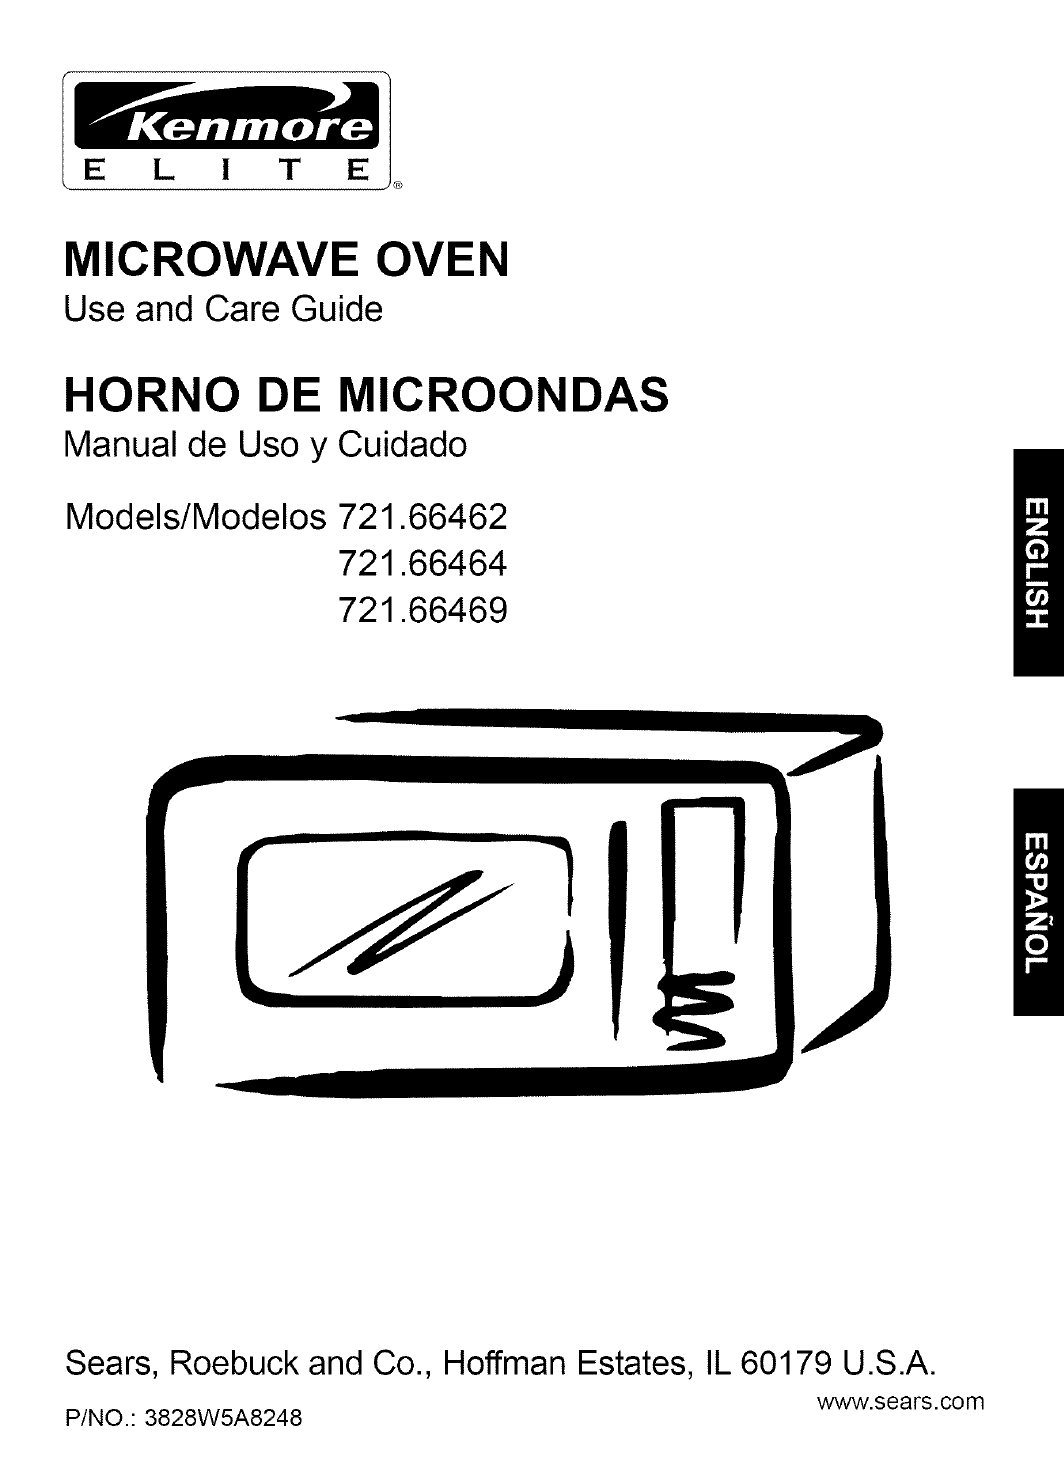 Microwave Trim Kit Installation Kenmore 721 66462 Users Manual